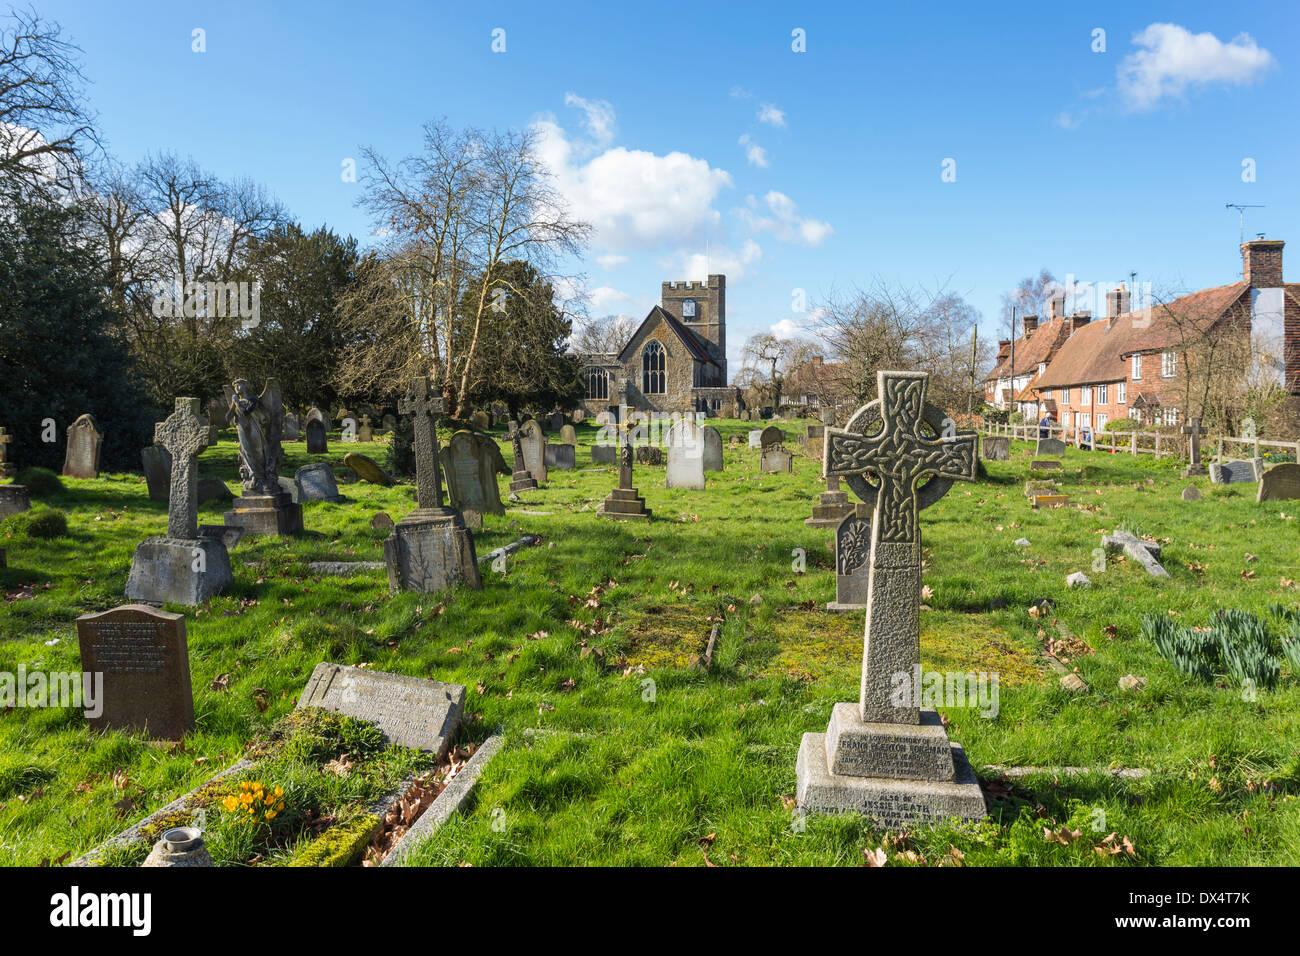 Graveyard at St Peter and St Paul Church Headcorn Kent - Stock Image